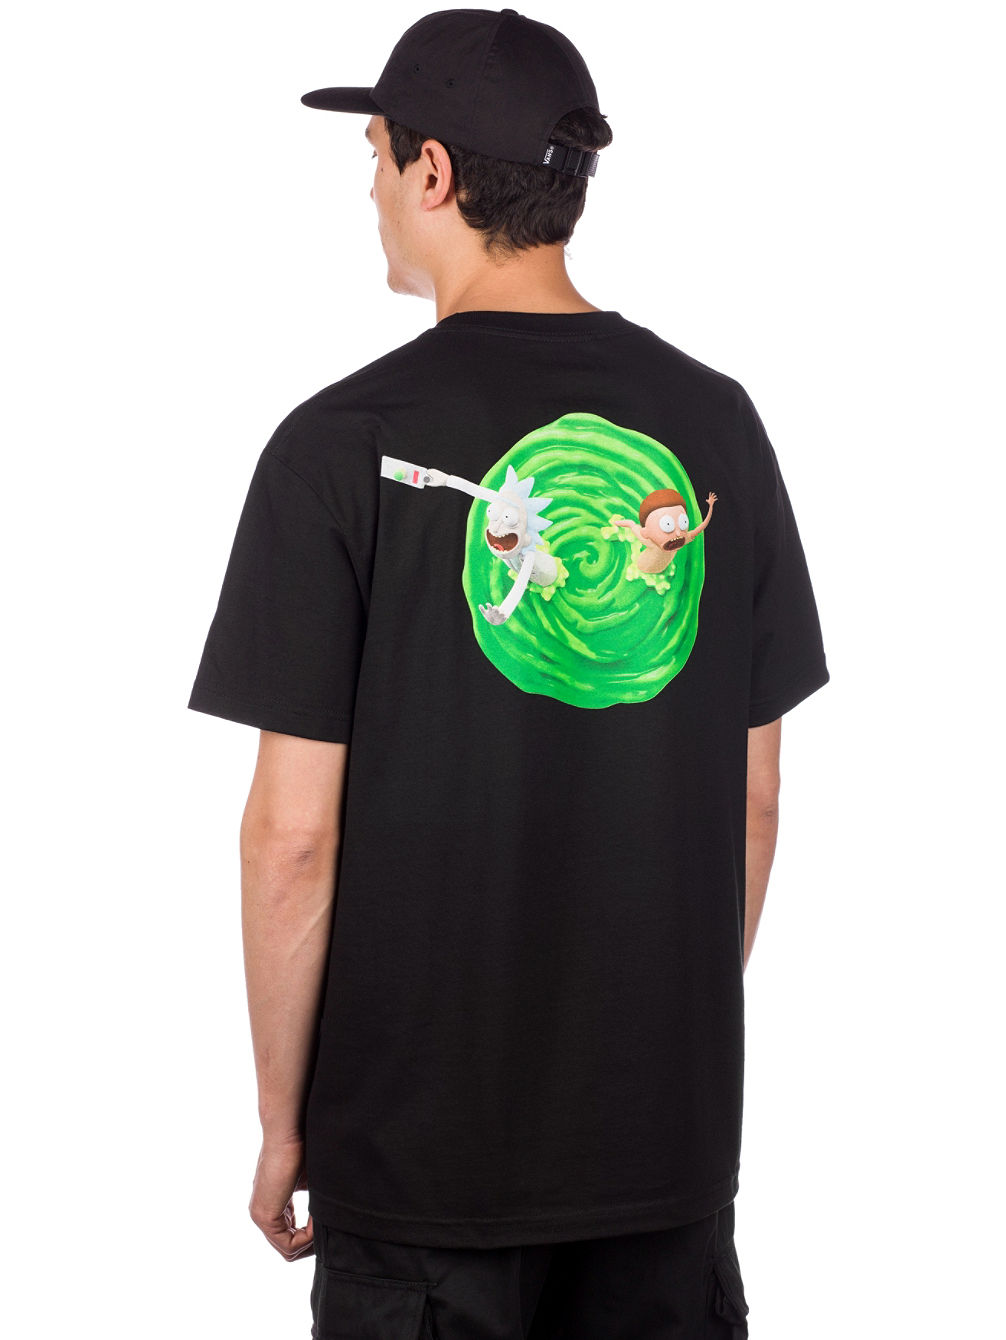 99f979fd18 Buy Primitive Rick & Morty 3D T-Shirt online at Blue Tomato